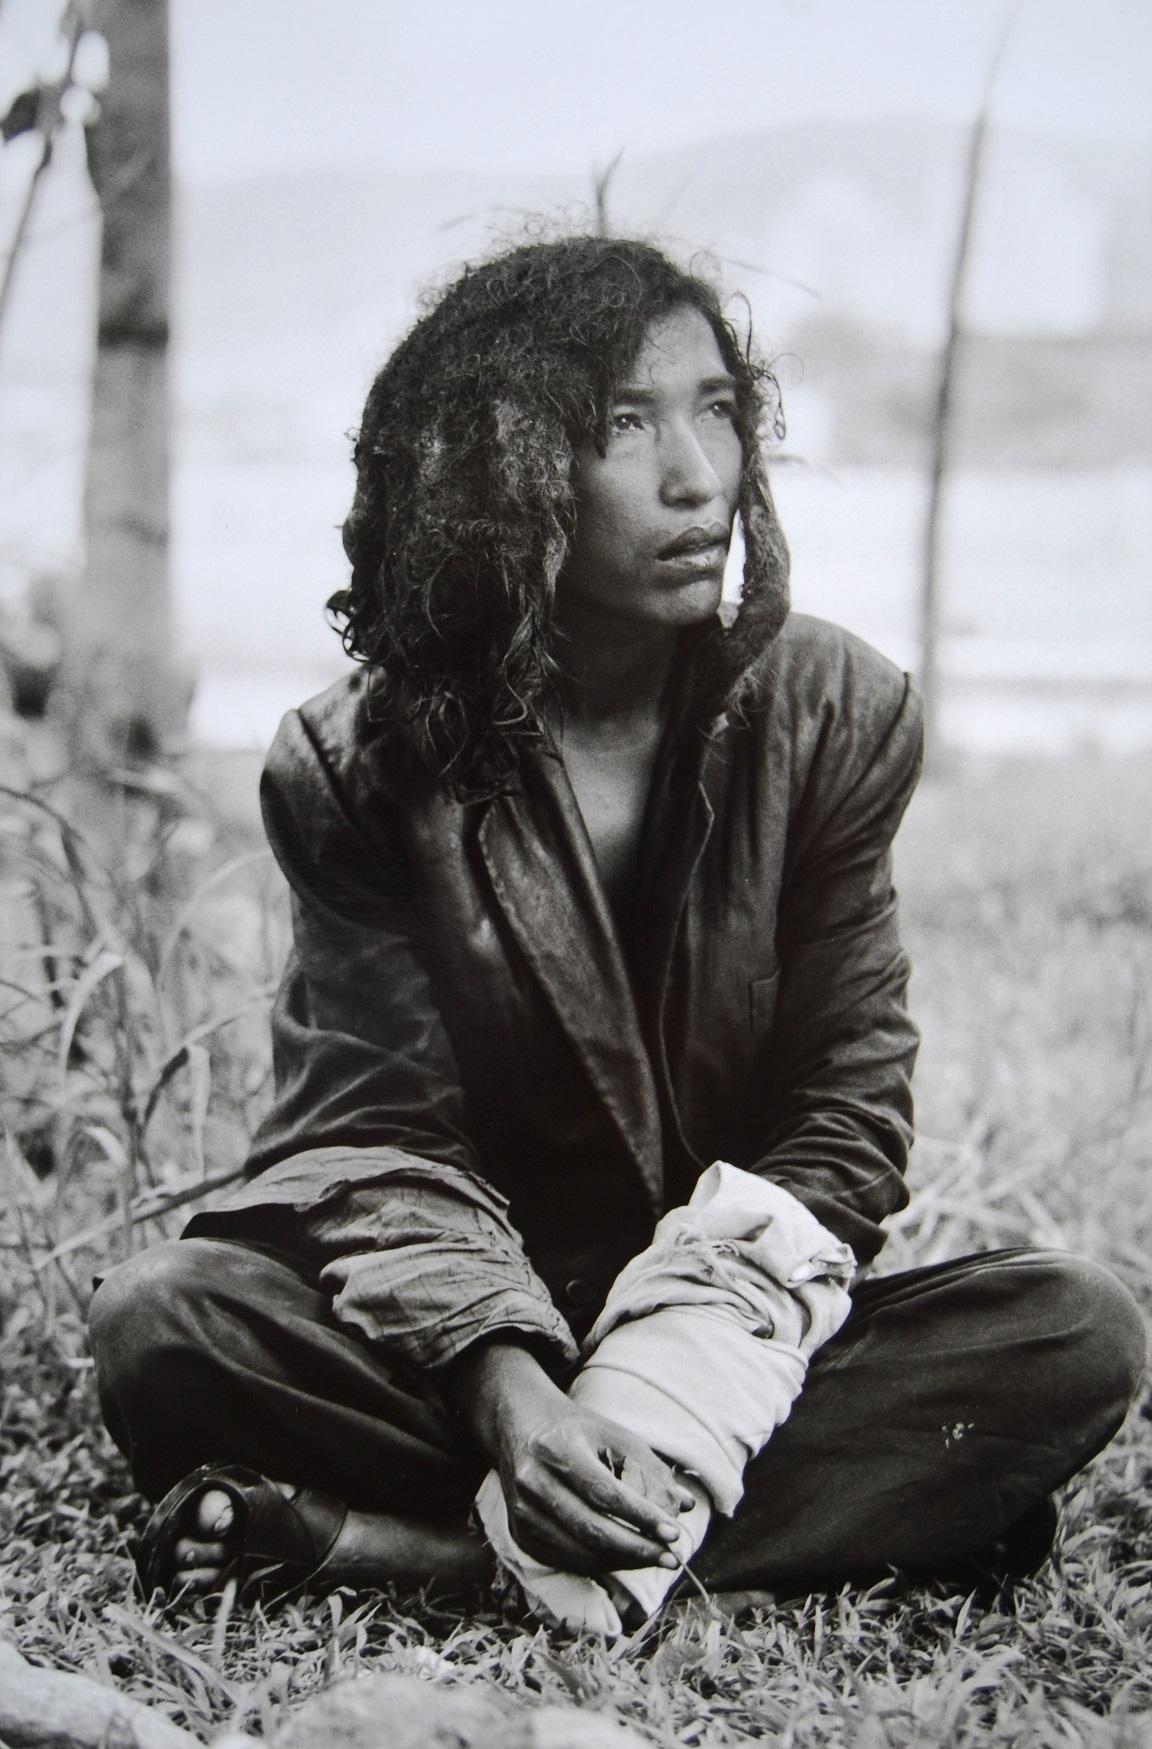 Lisetta Carmi, Venezuela, donna india a Petare (Caracas),1969 @Lisetta Carmi, courtesy Martini & Ronchetti 01